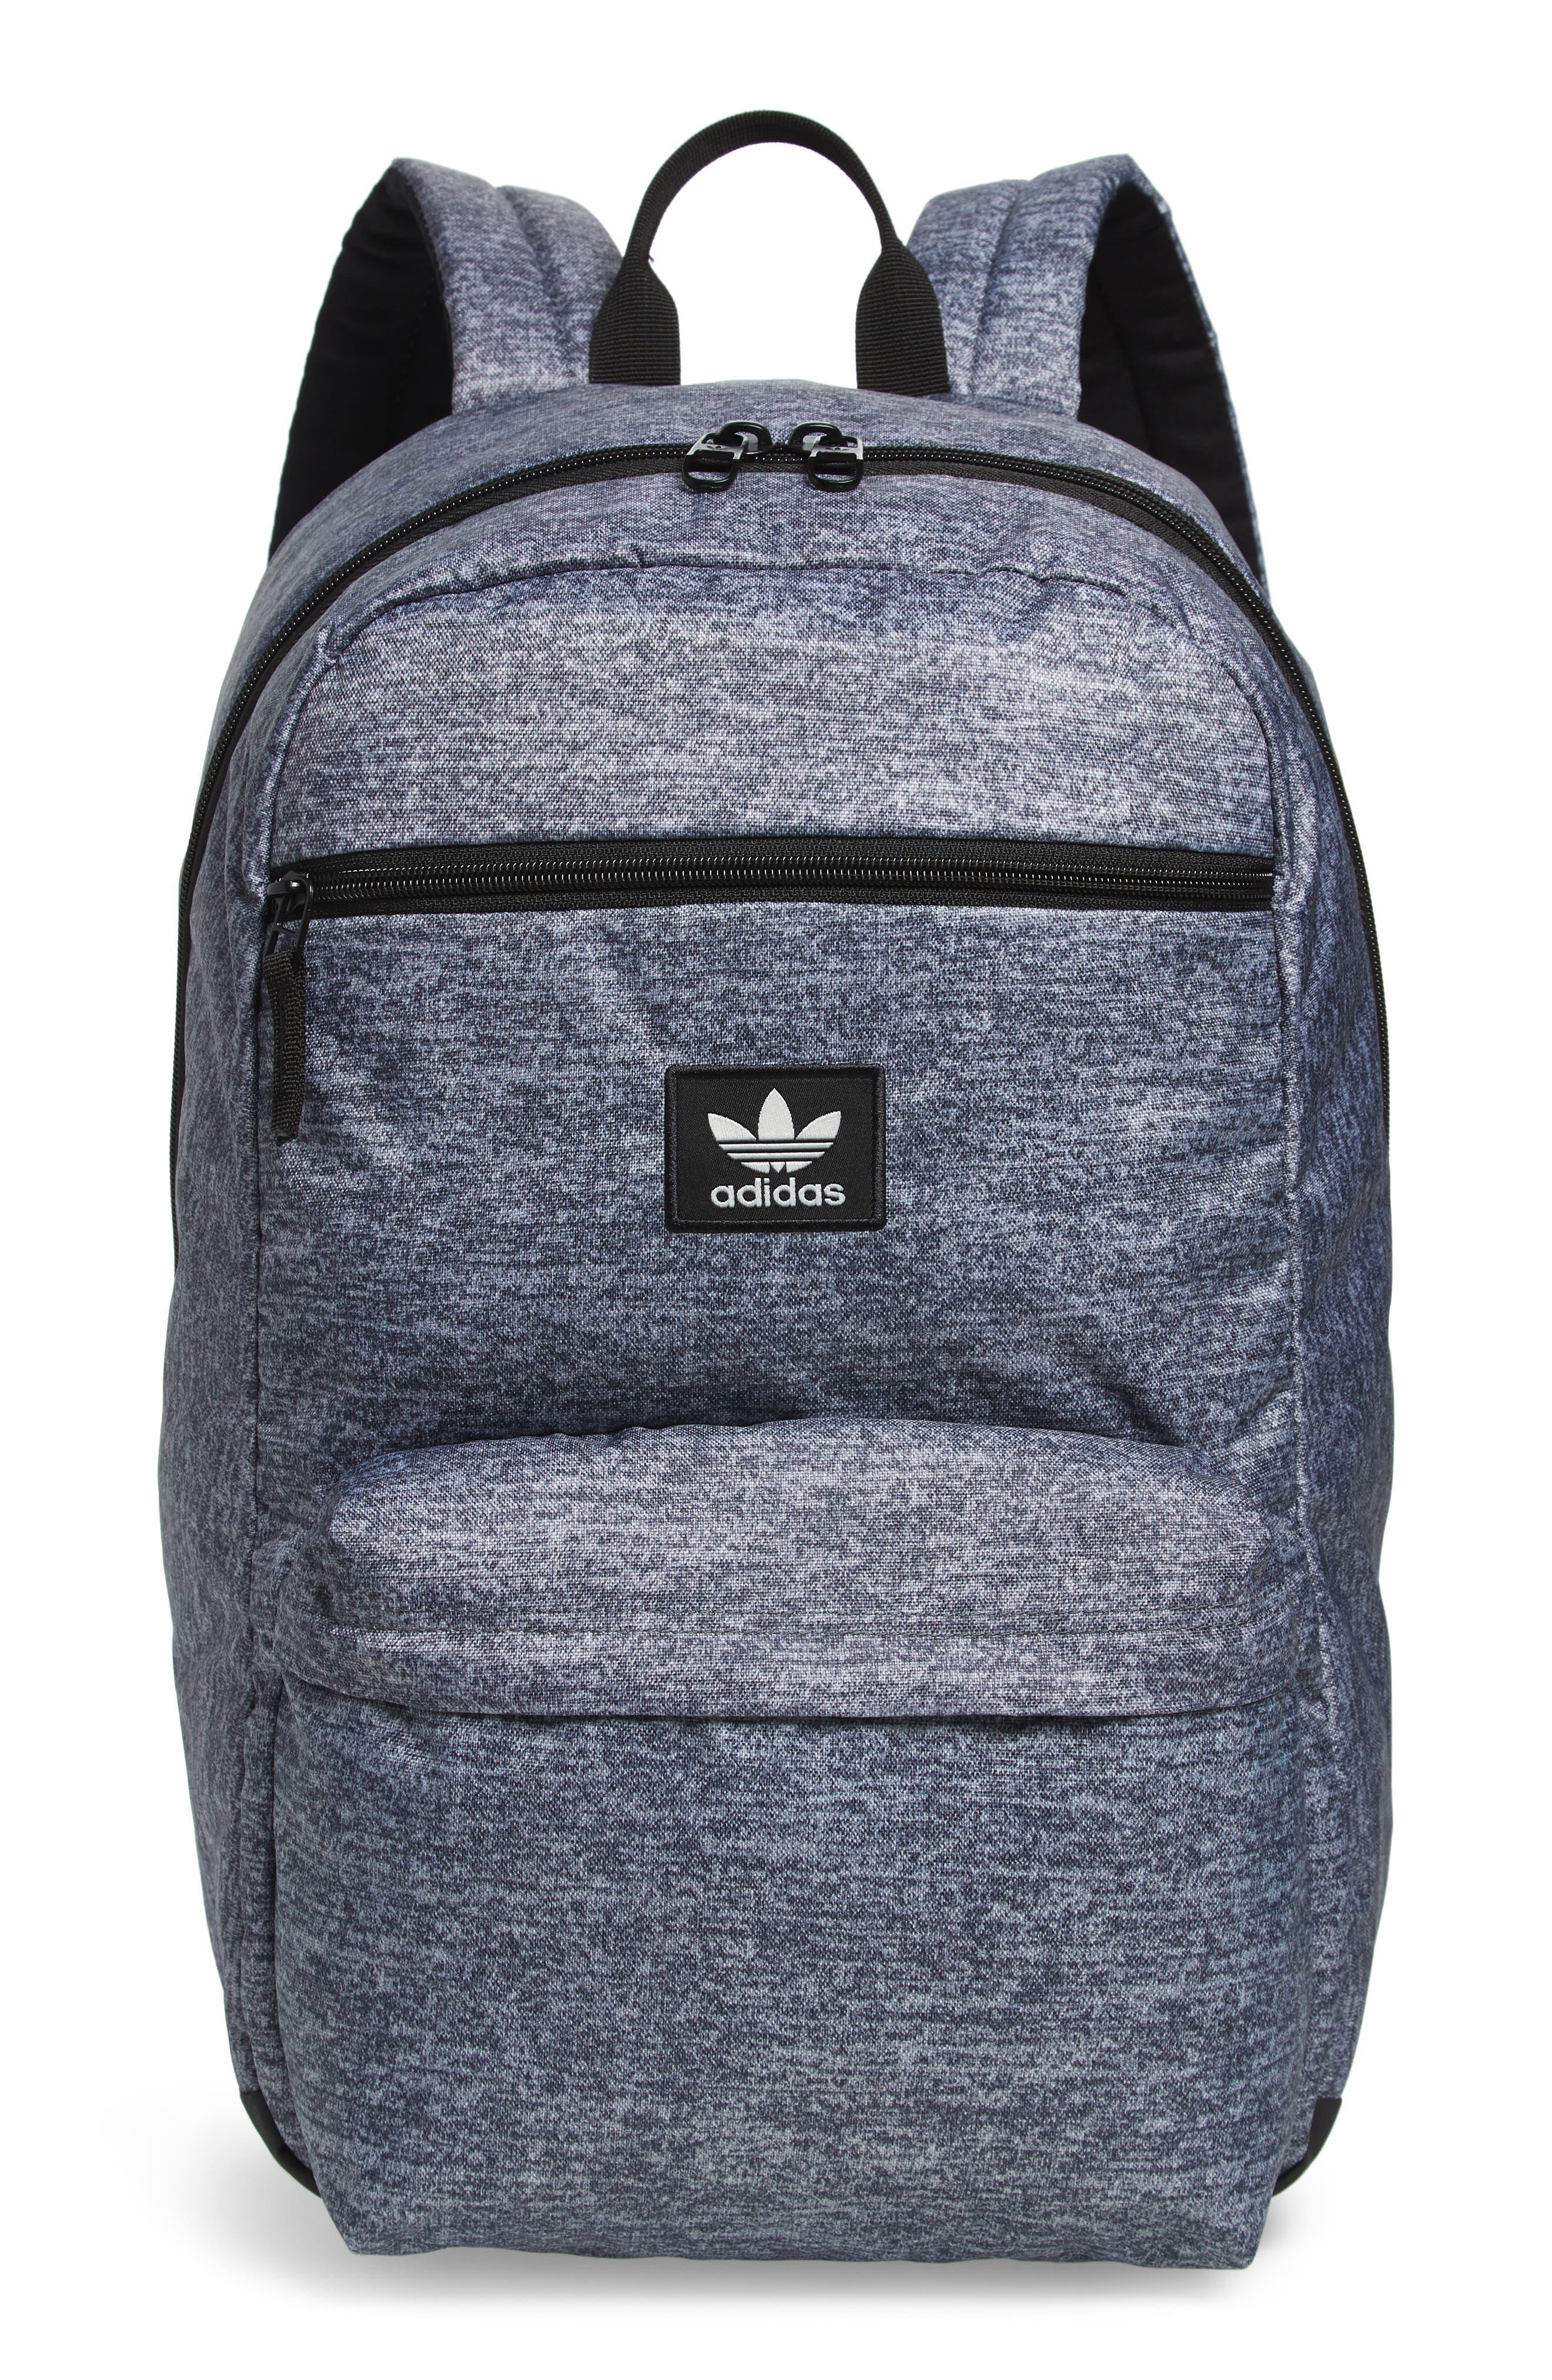 adidas Original National Backpack,                         Main,                         color, ONYX JERSEY/ BLACK